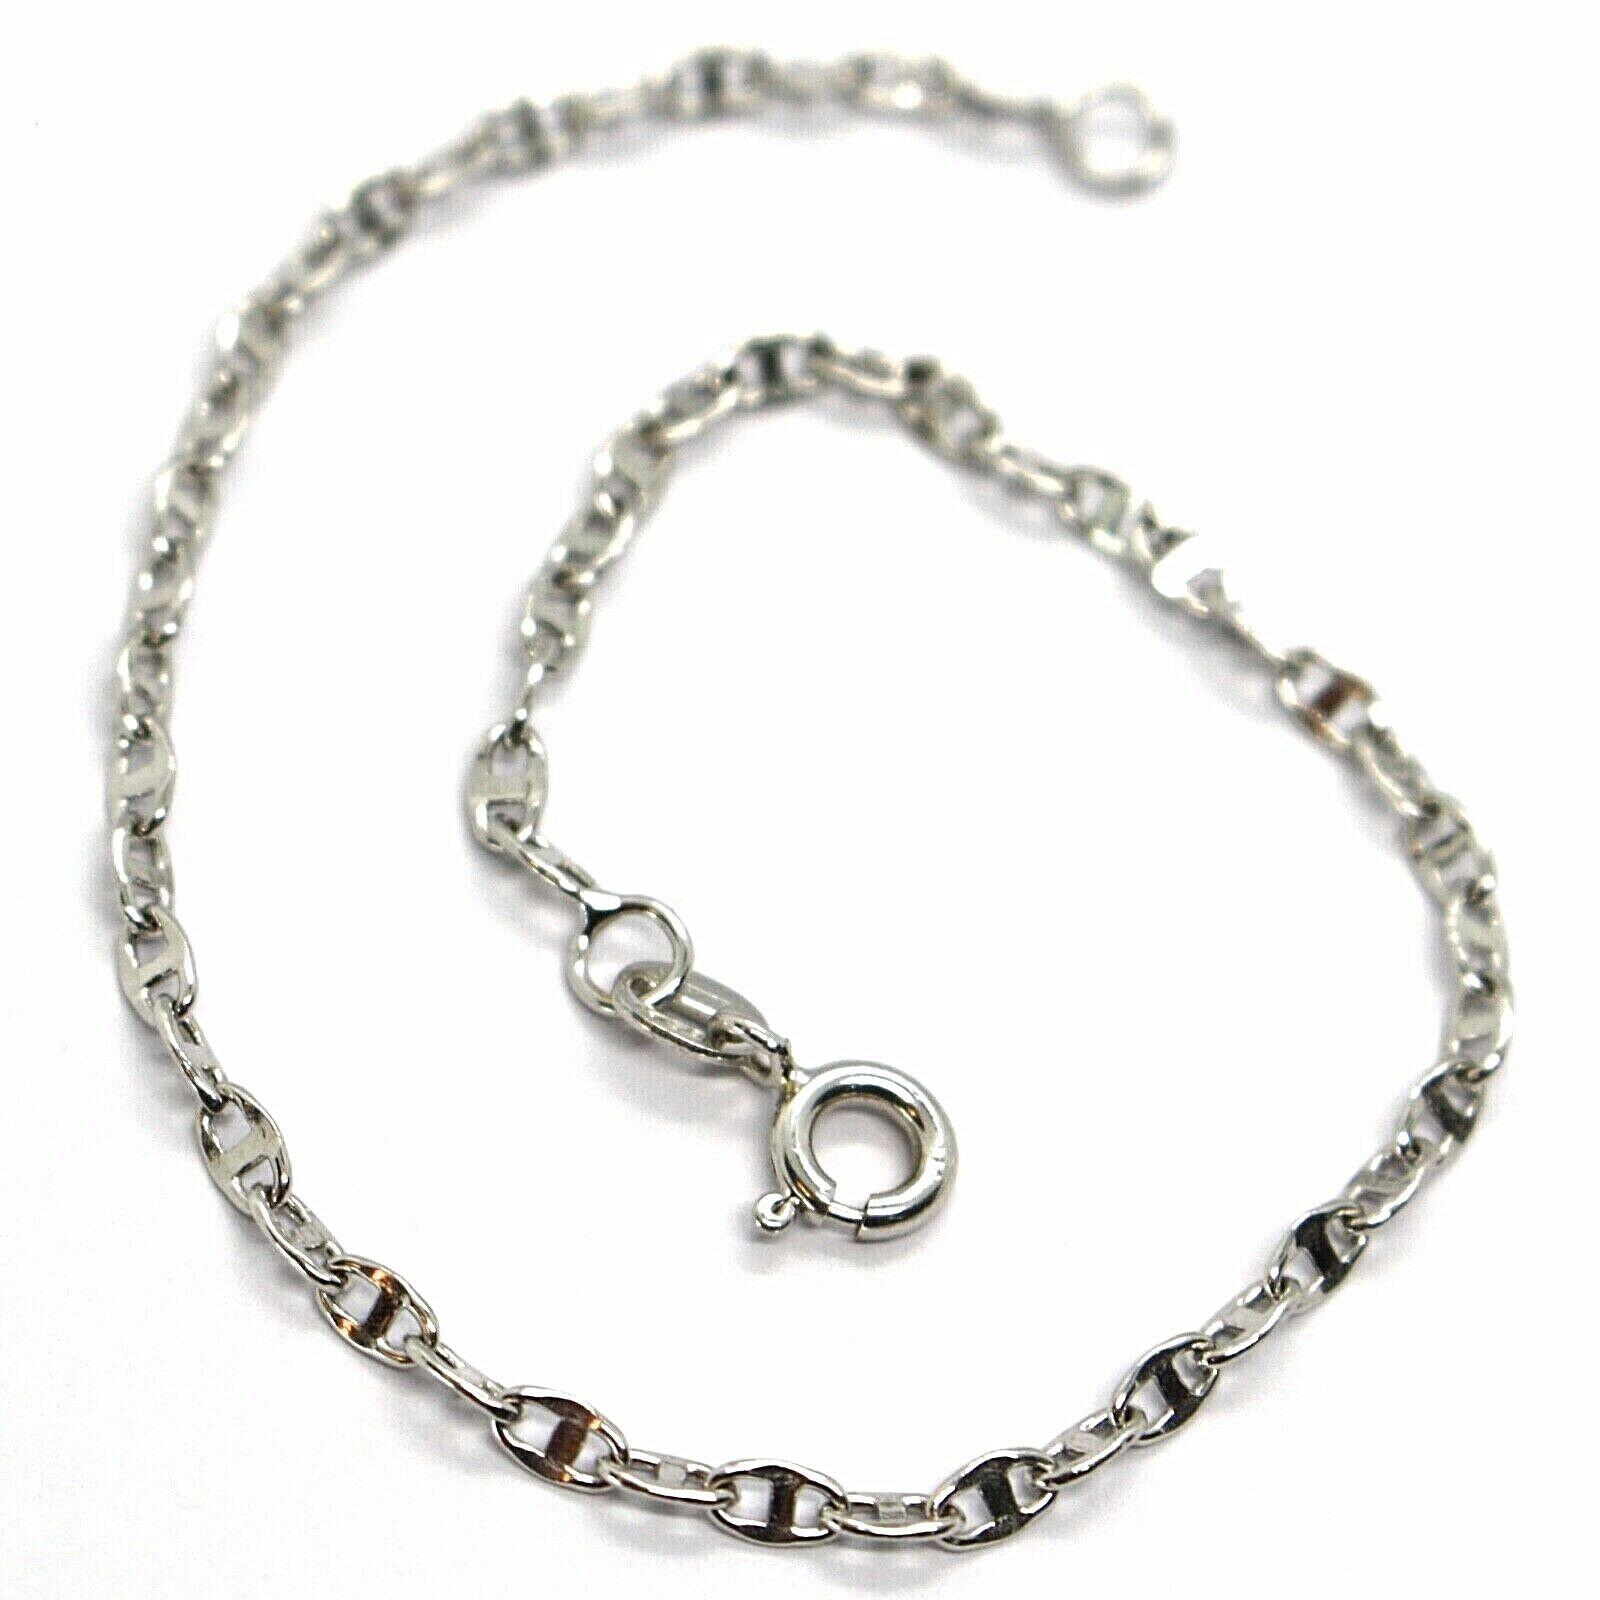 Bracelet White Gold 18K 750, Jersey Marina, Marinara, Crosspiece Criss Crossed